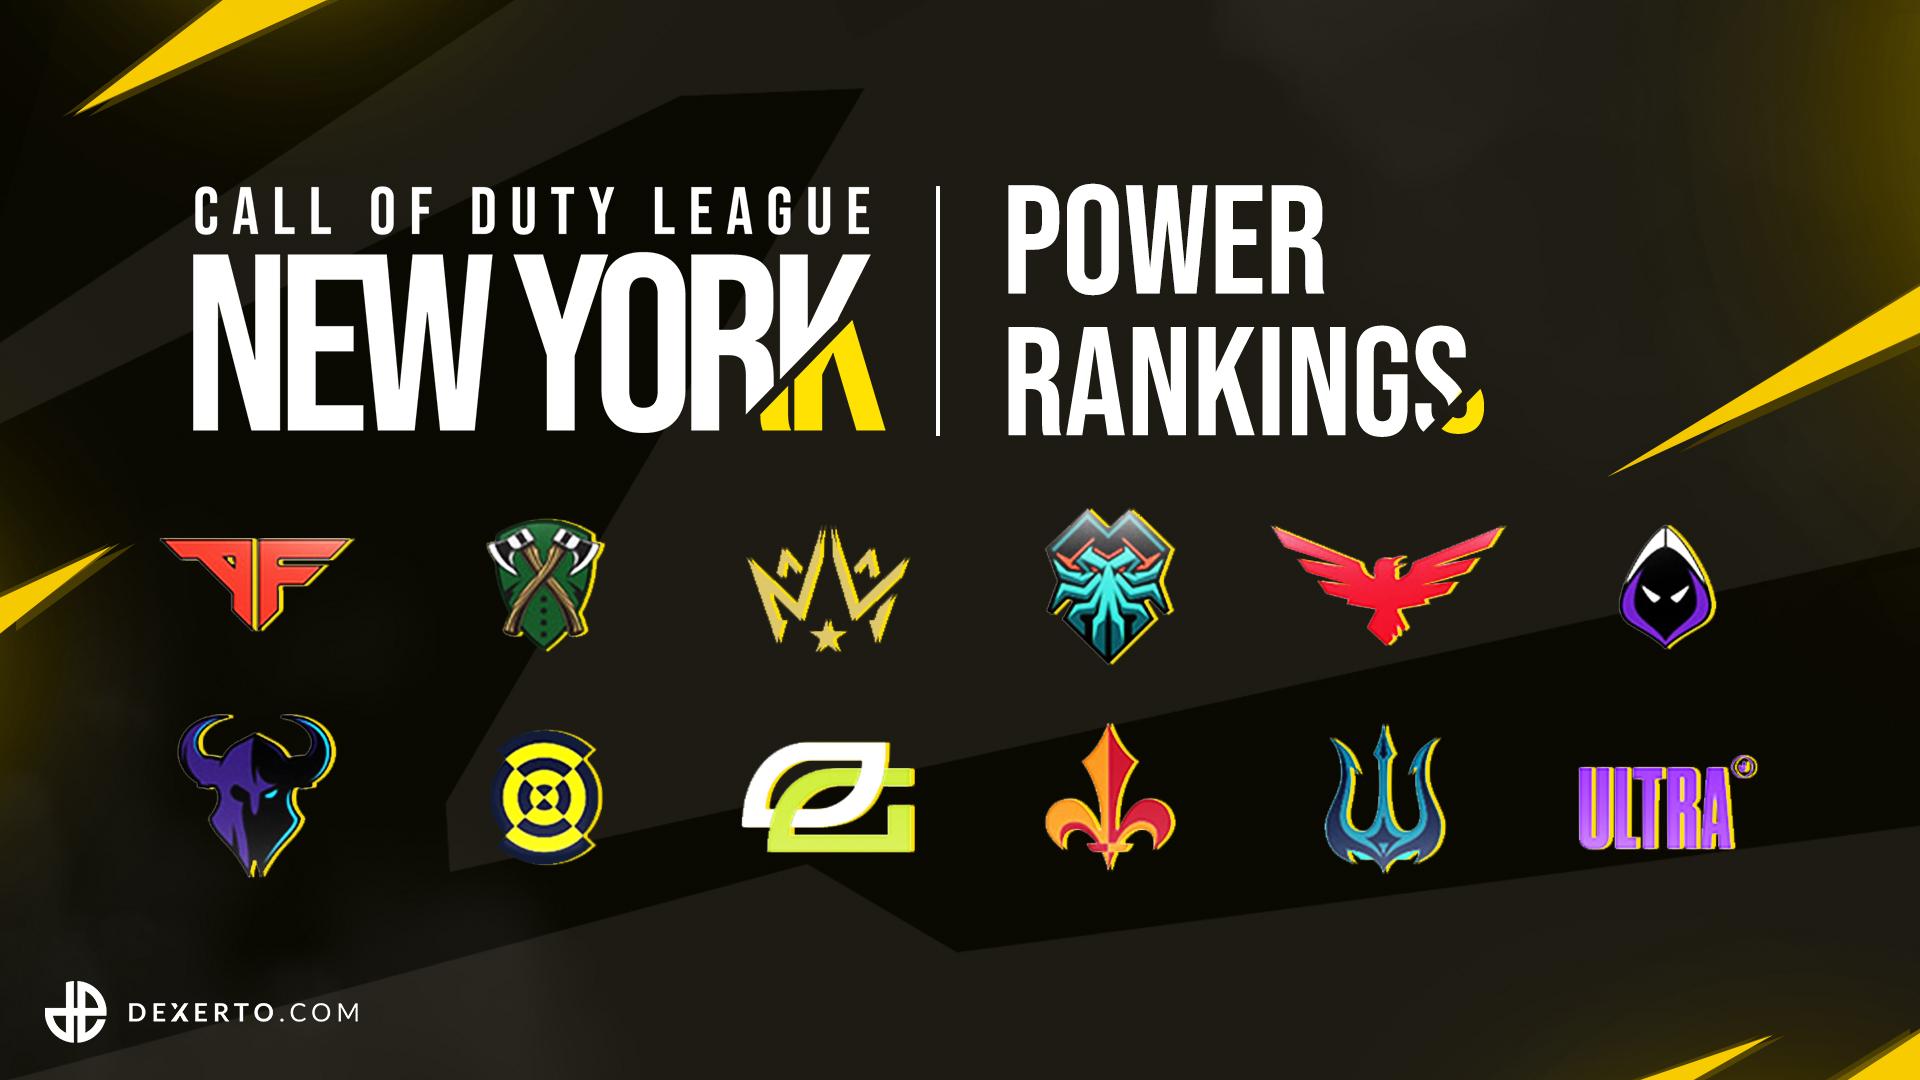 CDL New York Dexerto Power Rankings